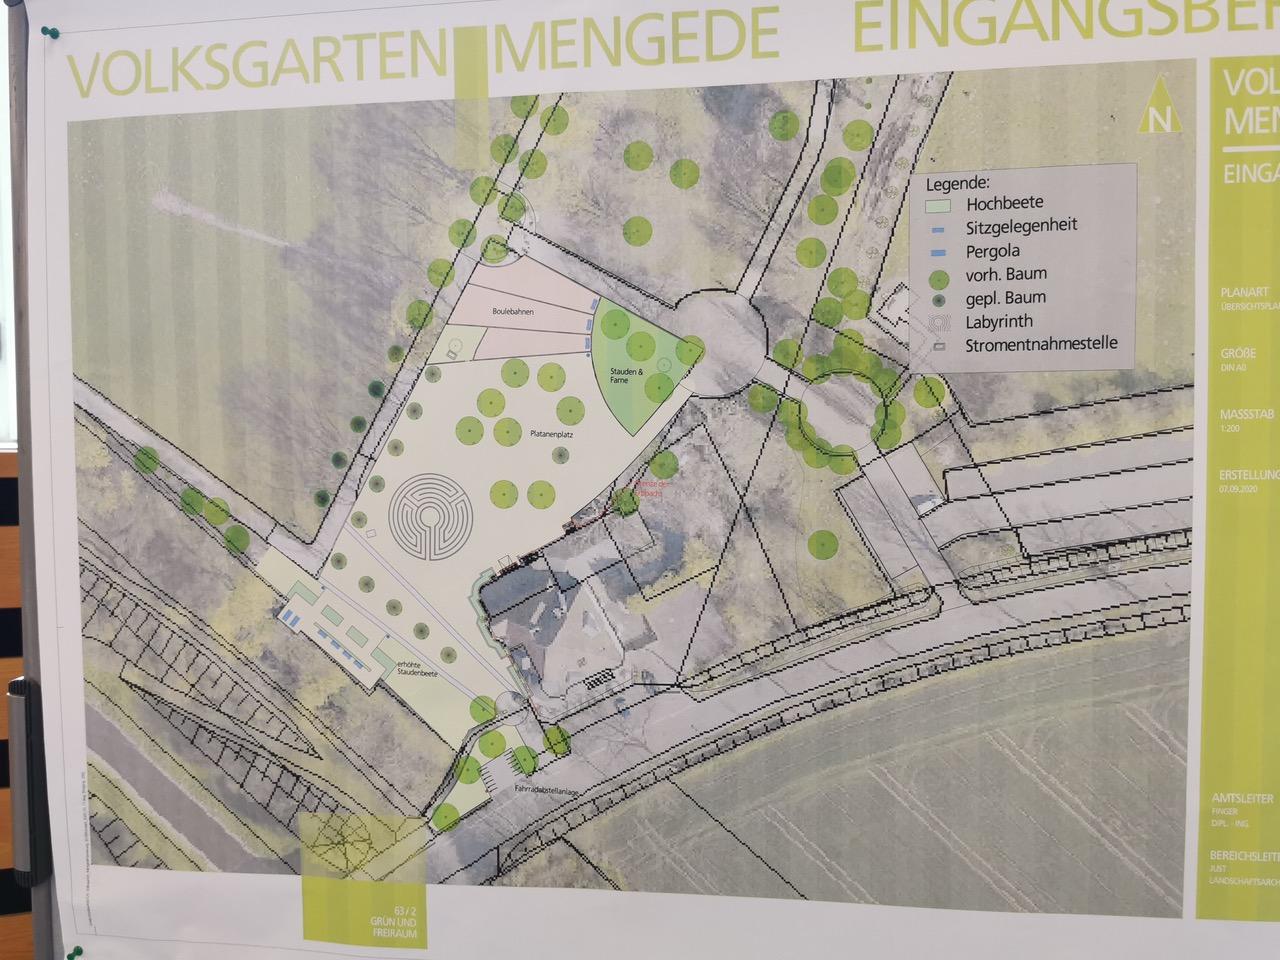 Bezirksvertretung stoppt Bauarbeiten im Mengeder Volksgarten